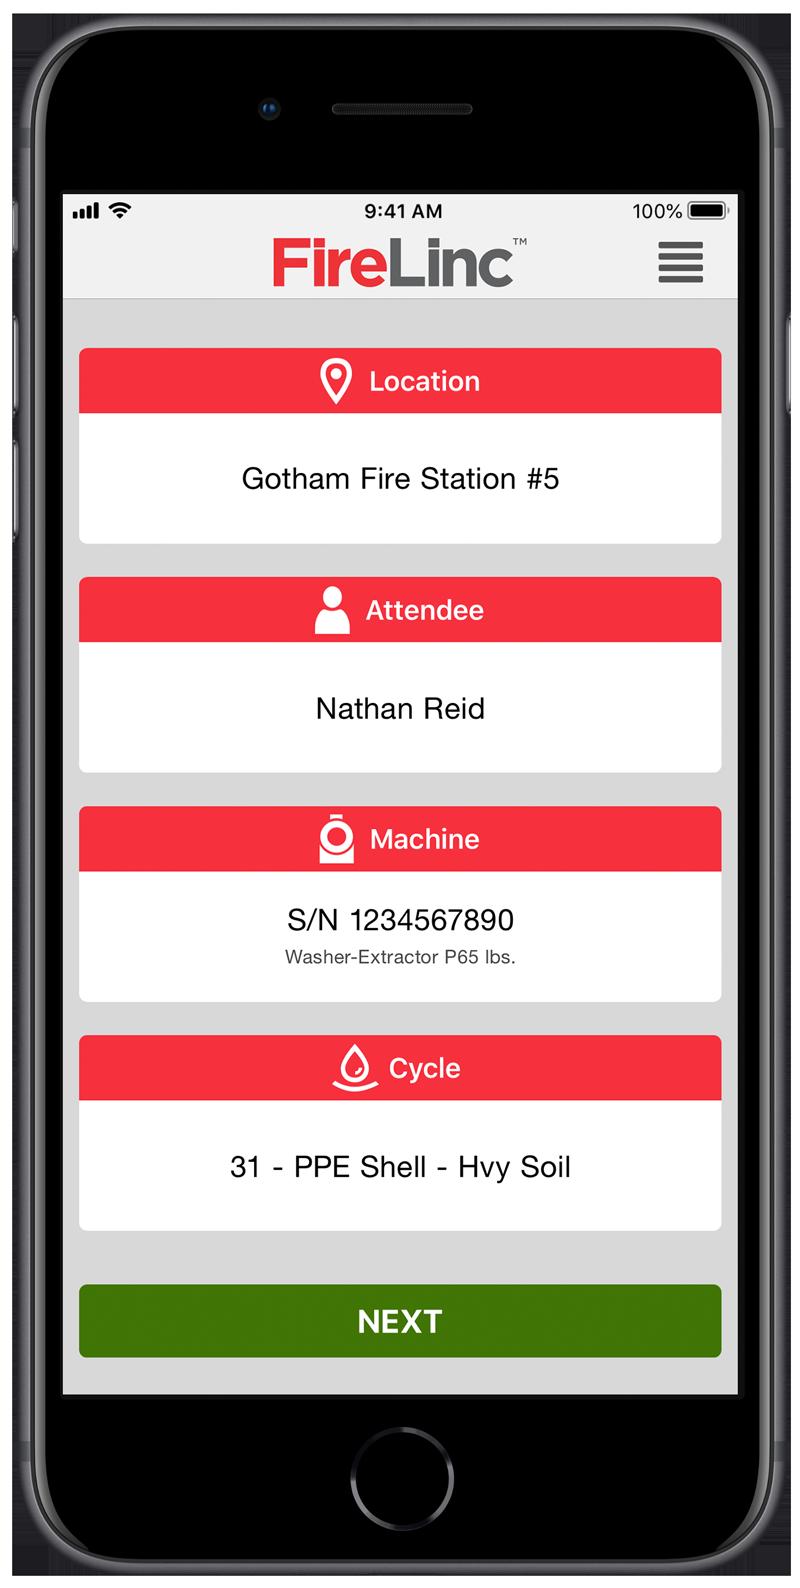 firelinc app displayed on phone